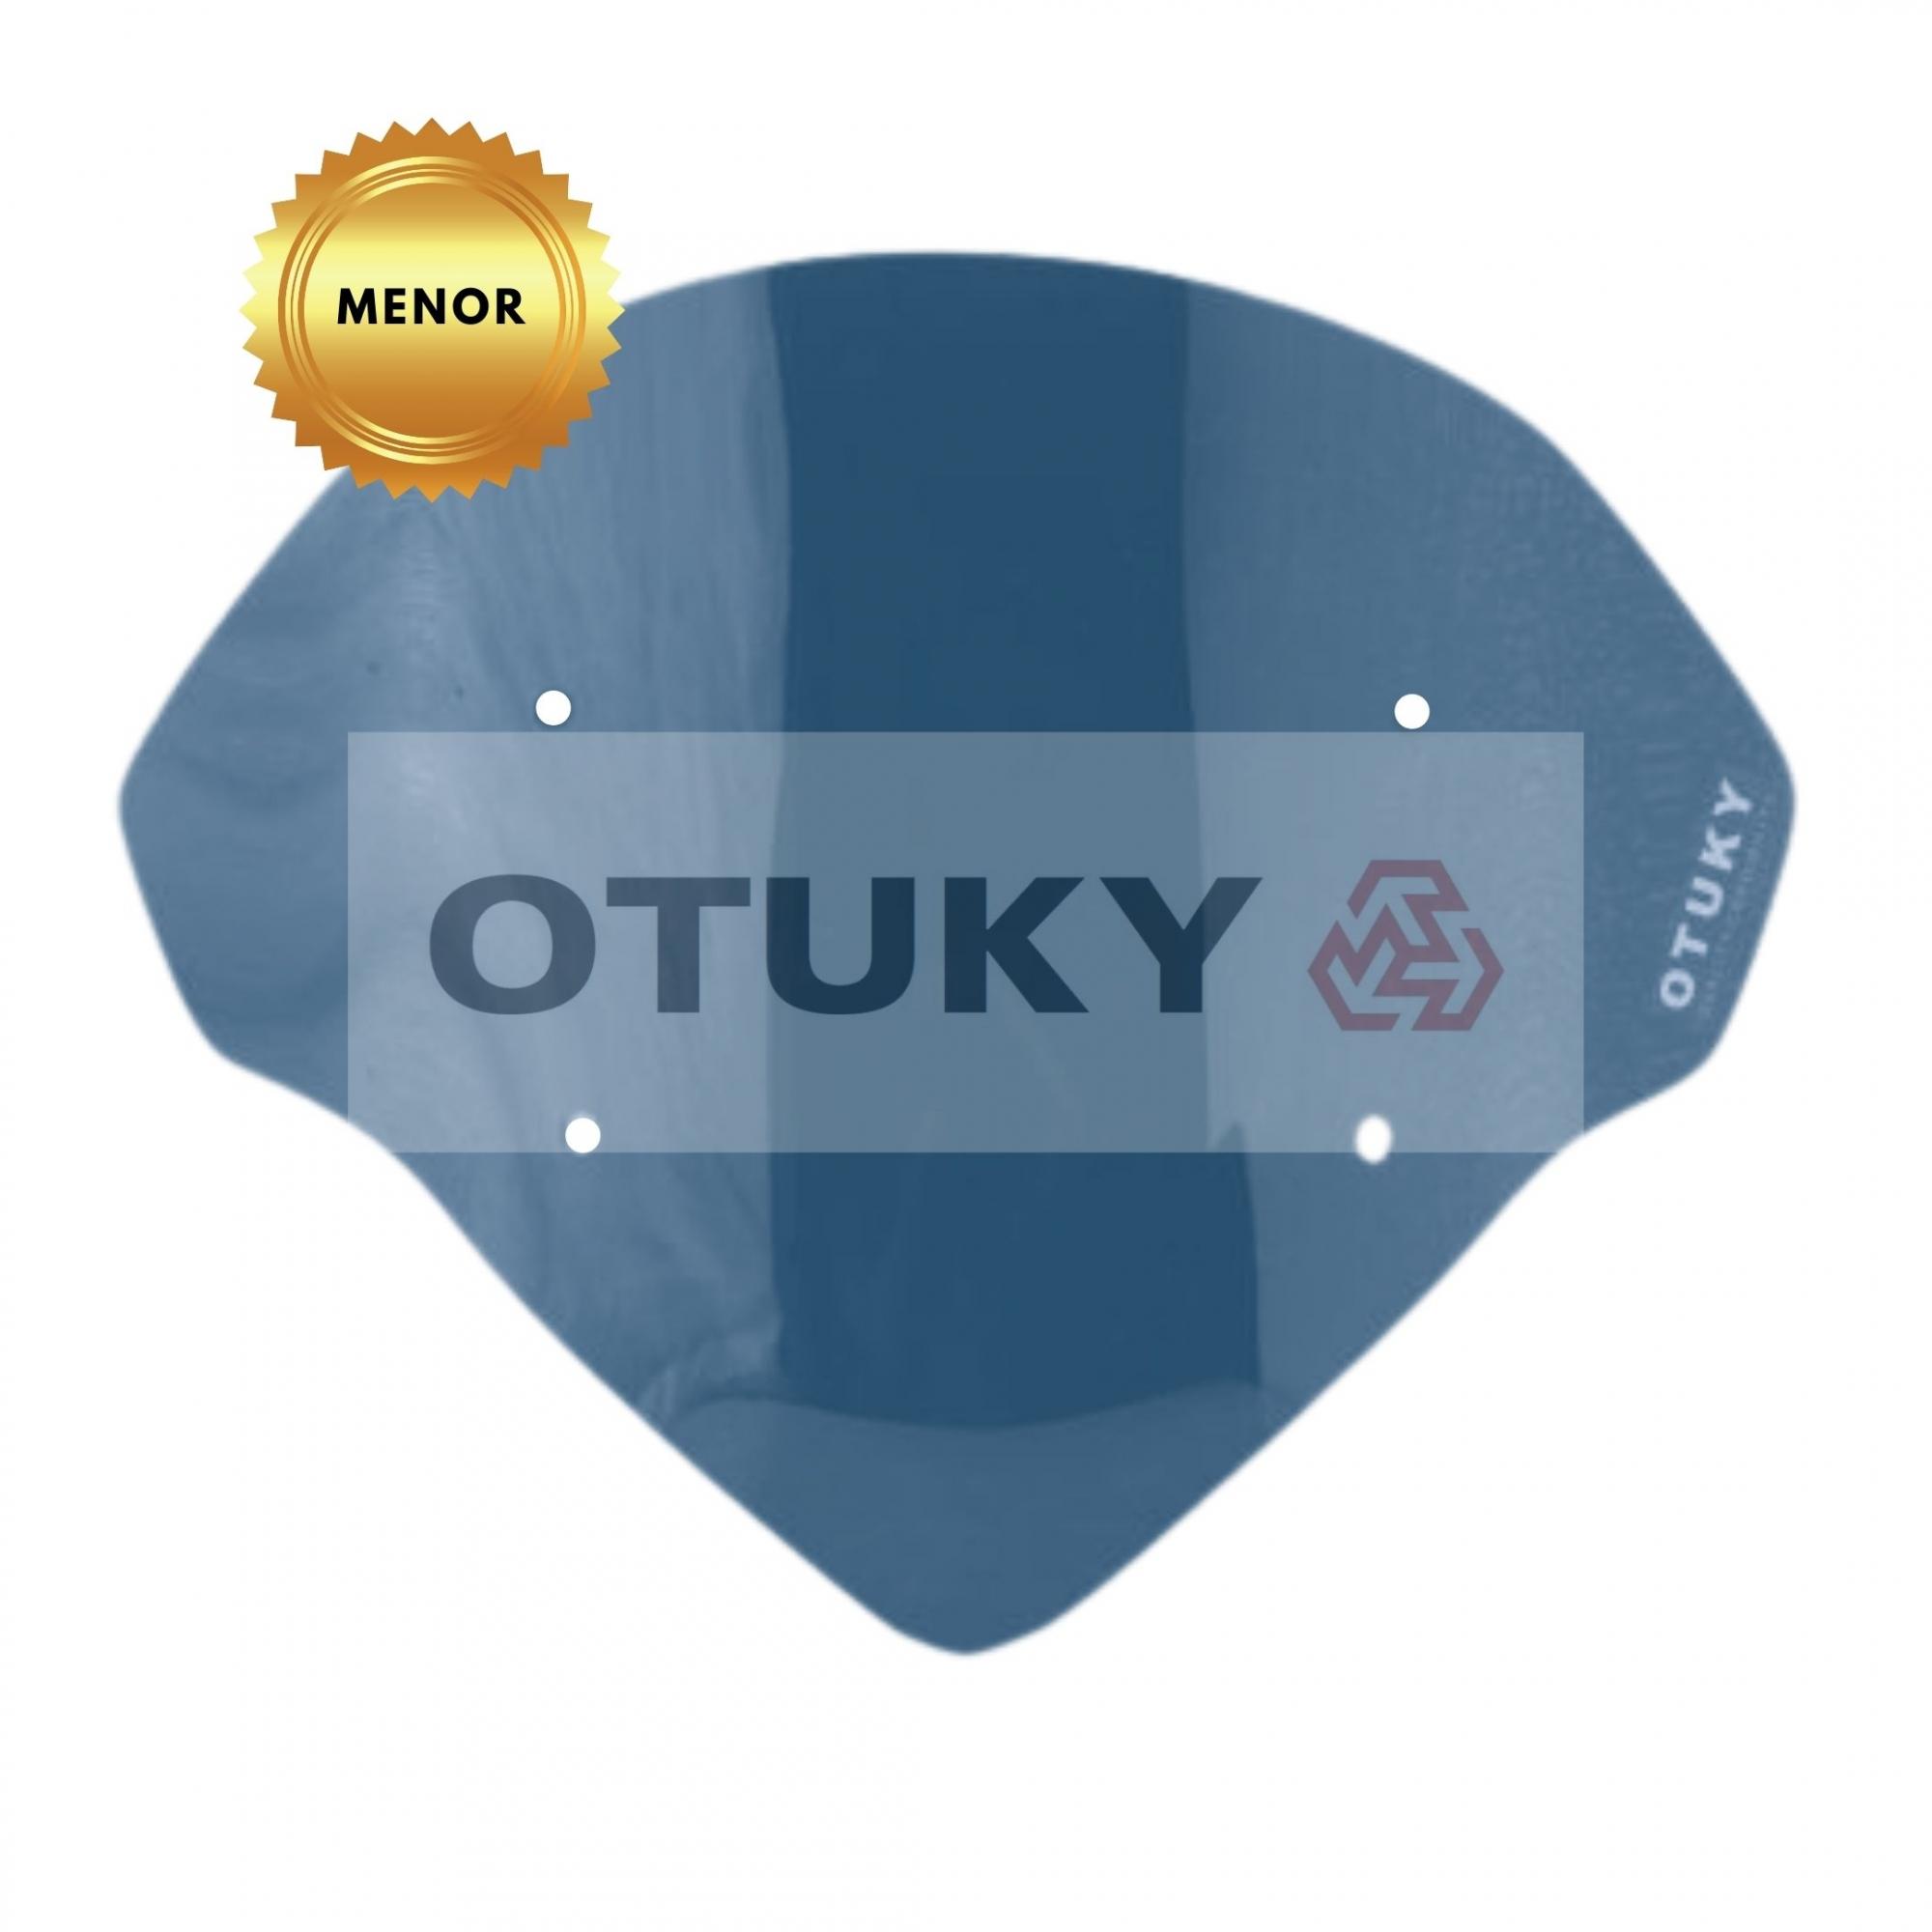 Bolha para Moto Ténéré 250 Xtz 2011 2012 2013 2014 2015 2016 2017 2018 Otuky Menor Fumê Escuro